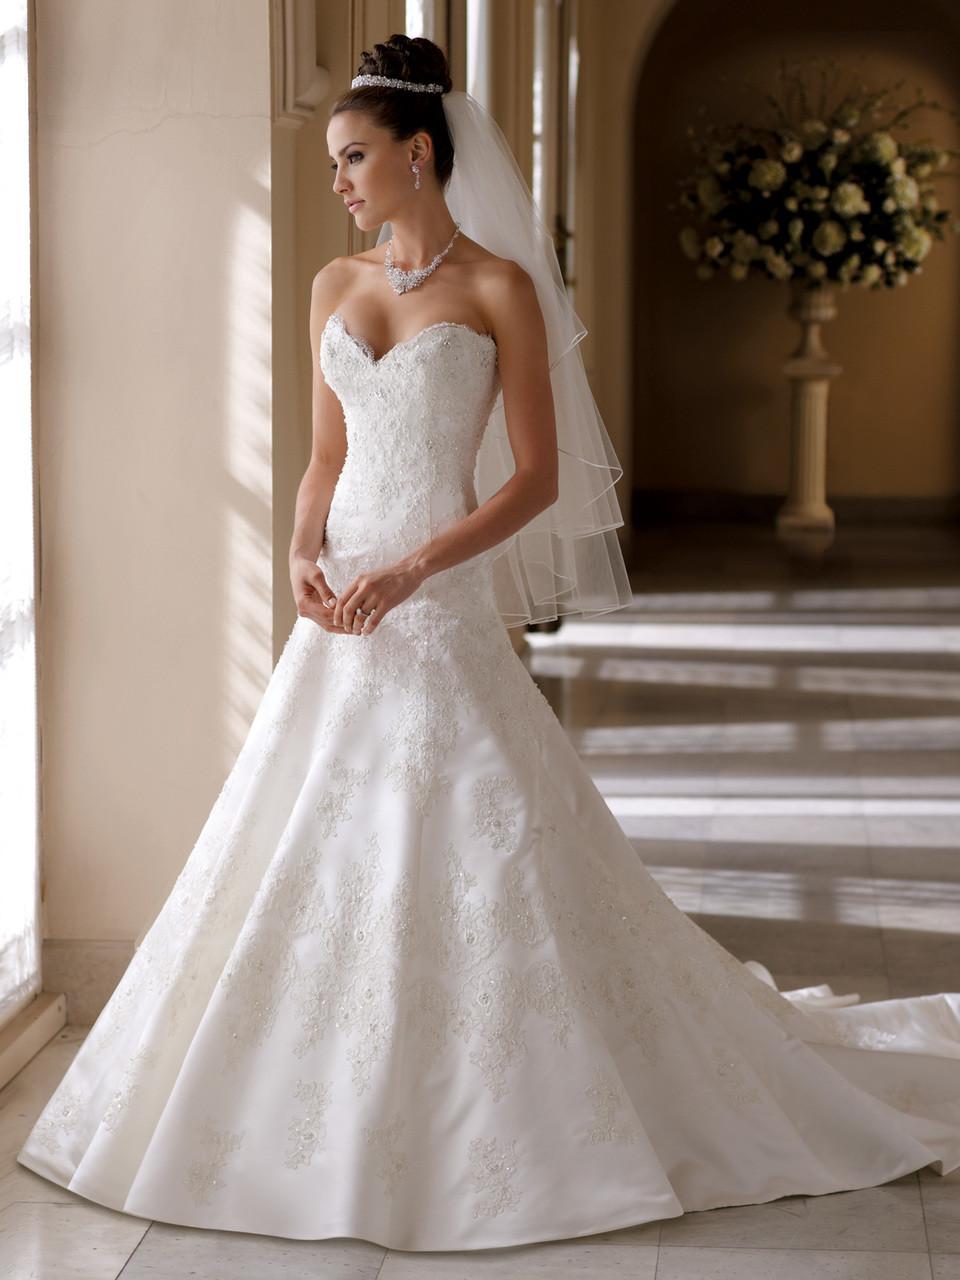 Sweetheart Wedding Gown Helen David Tutera 113215